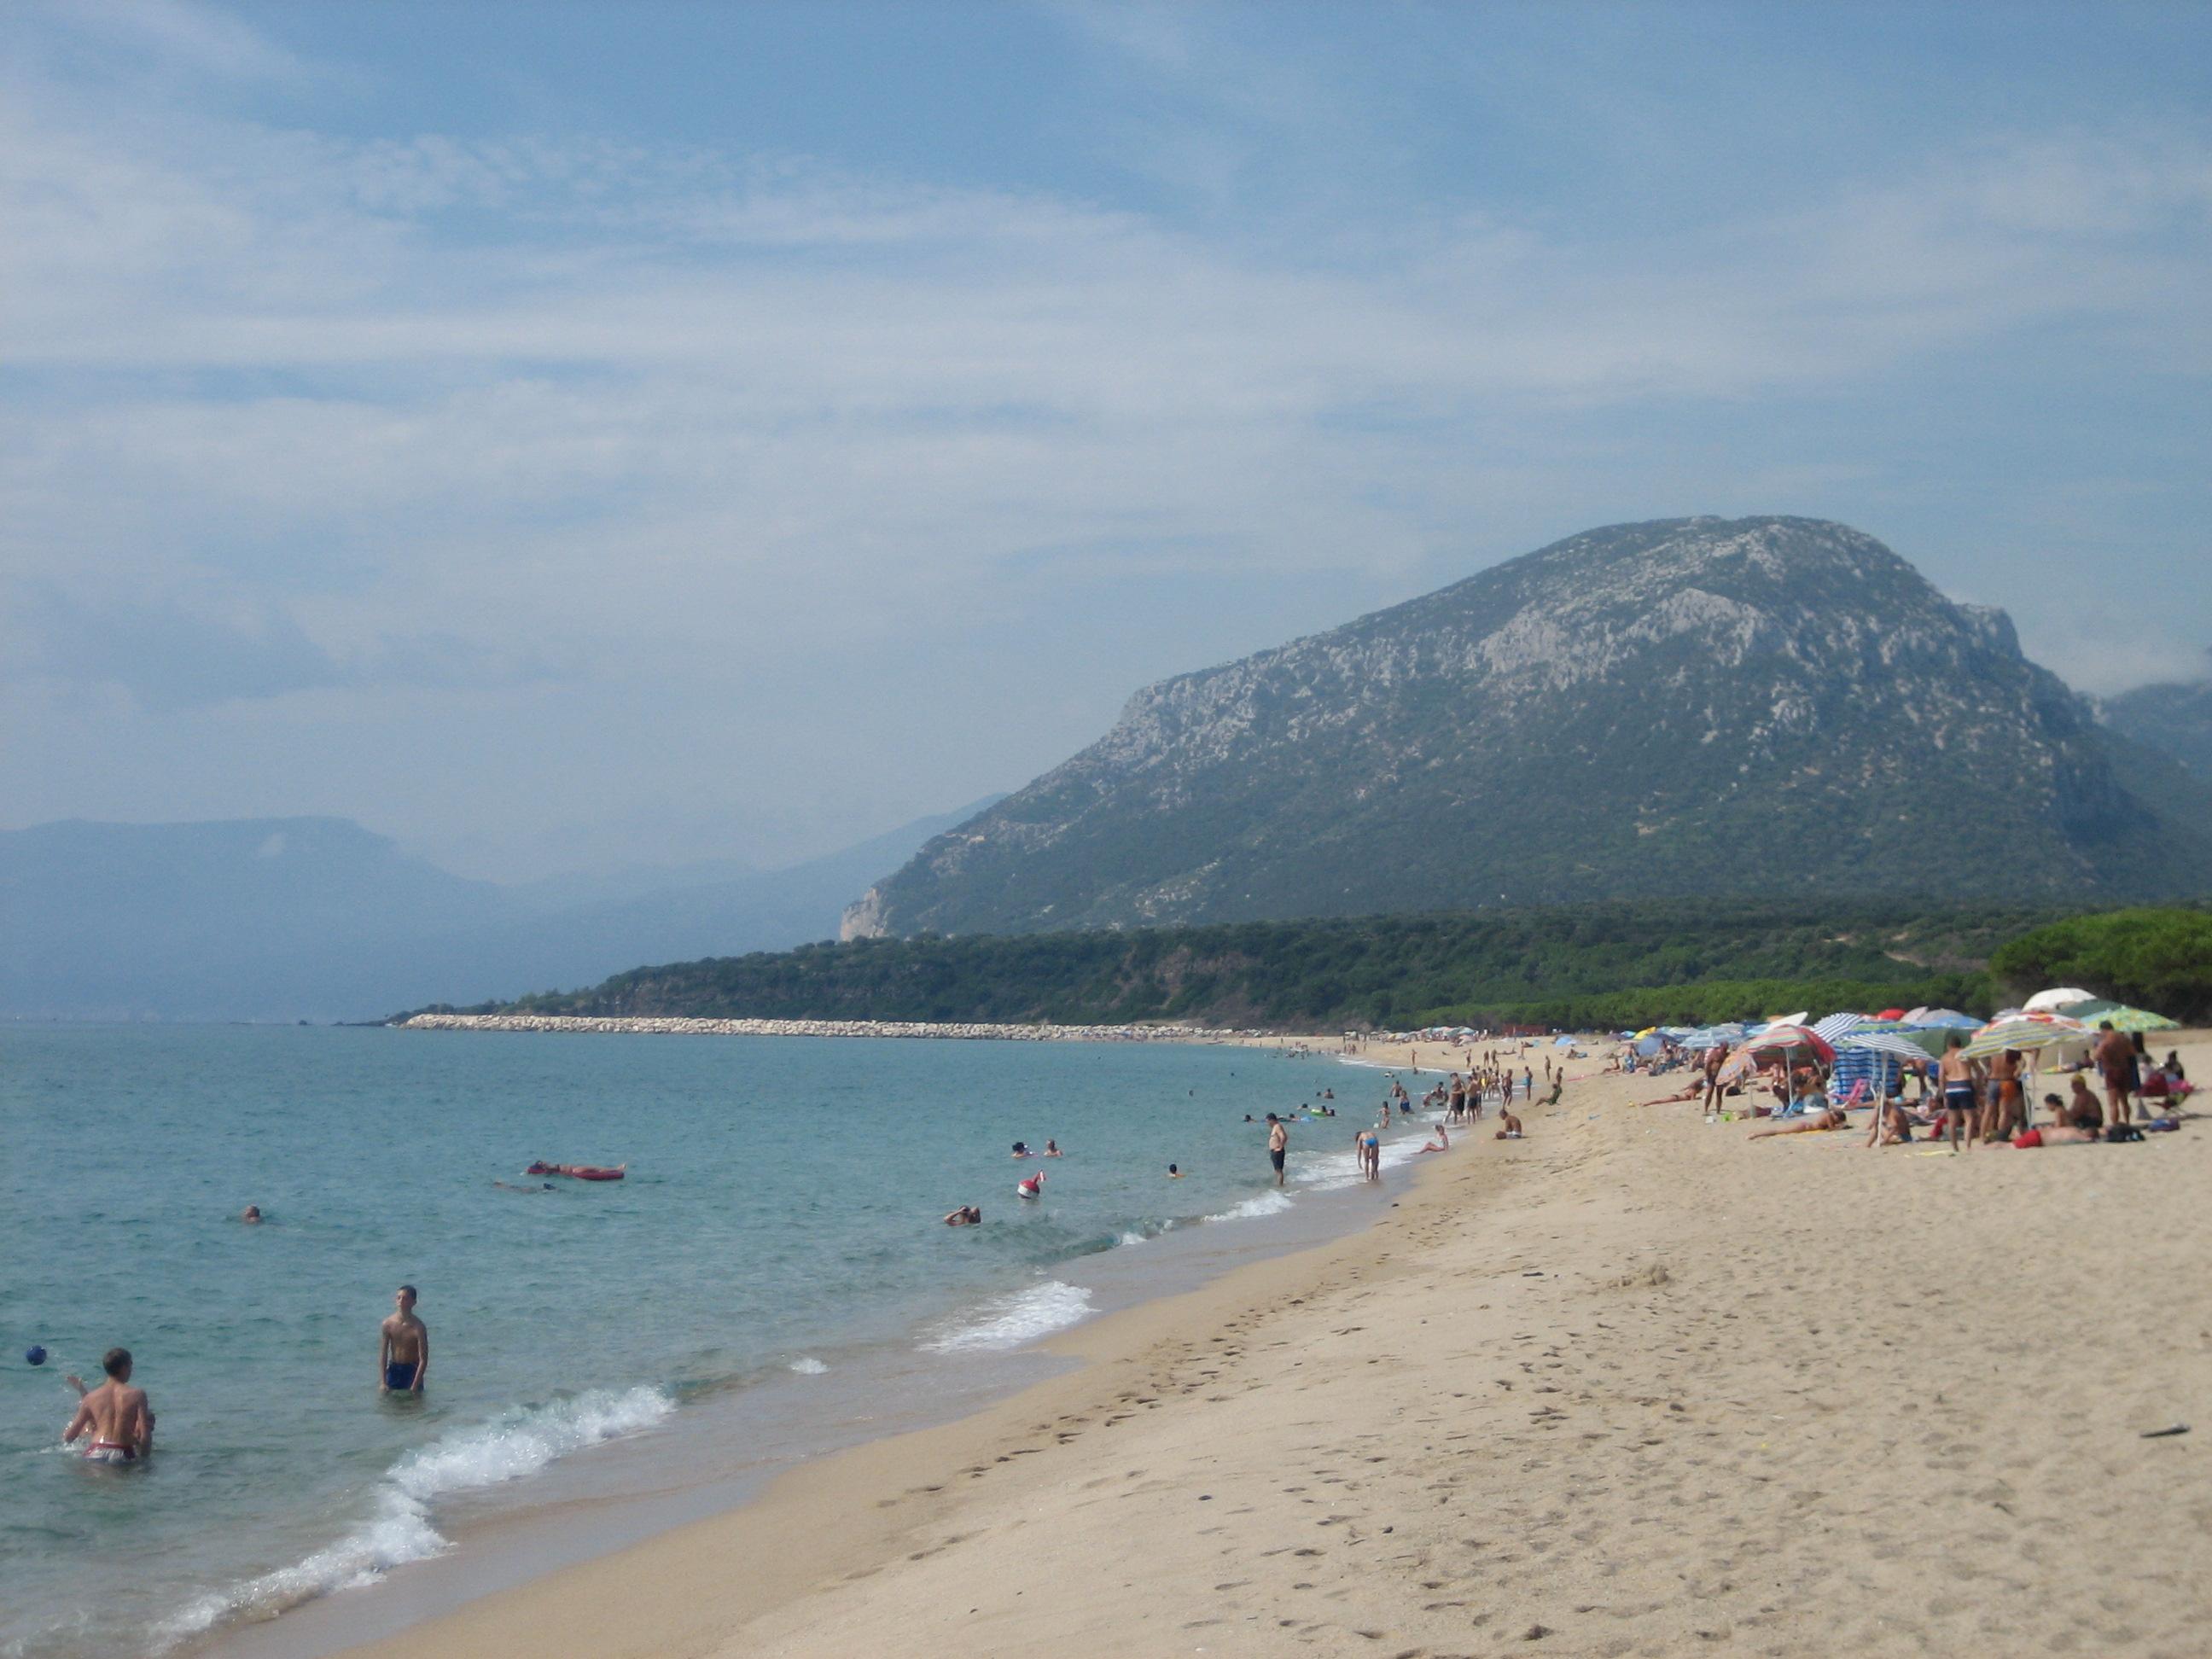 File:Orosei-Osala beach.jpg - Wikimedia Commons Beach